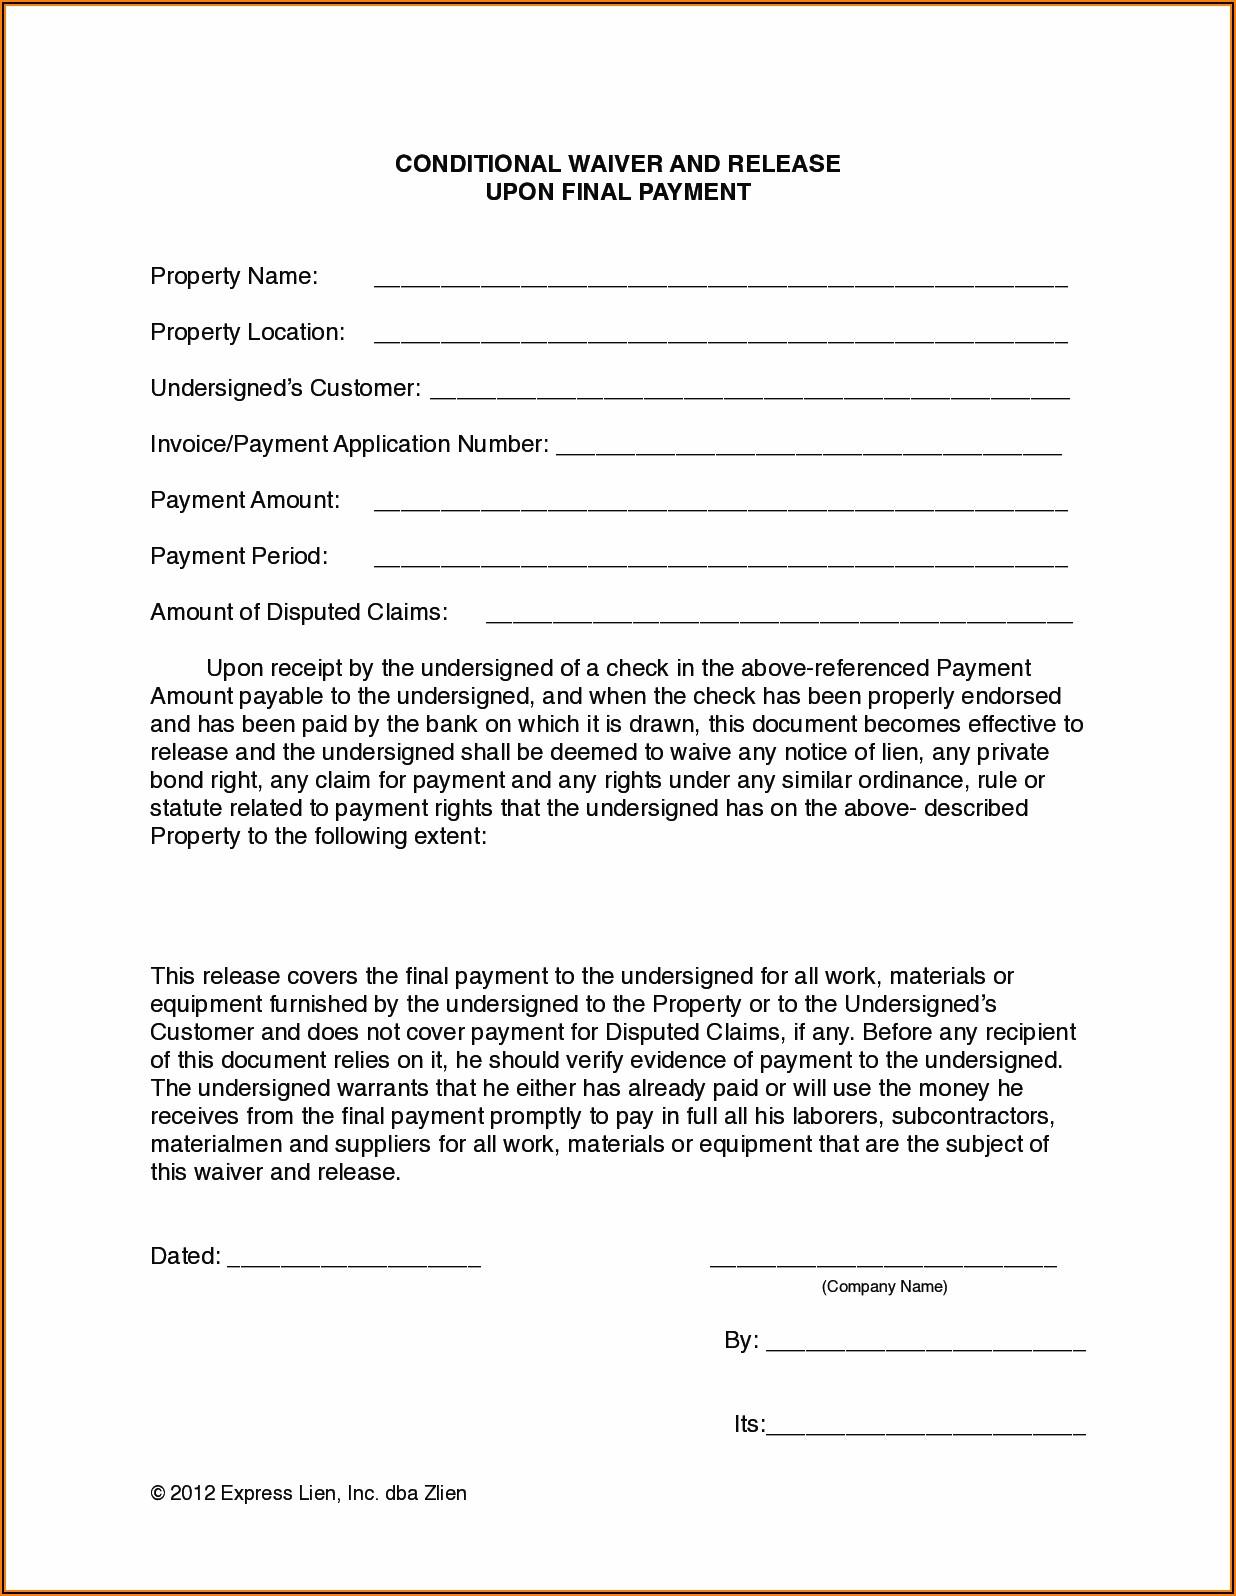 Arizona Statutory Lien Waiver Forms